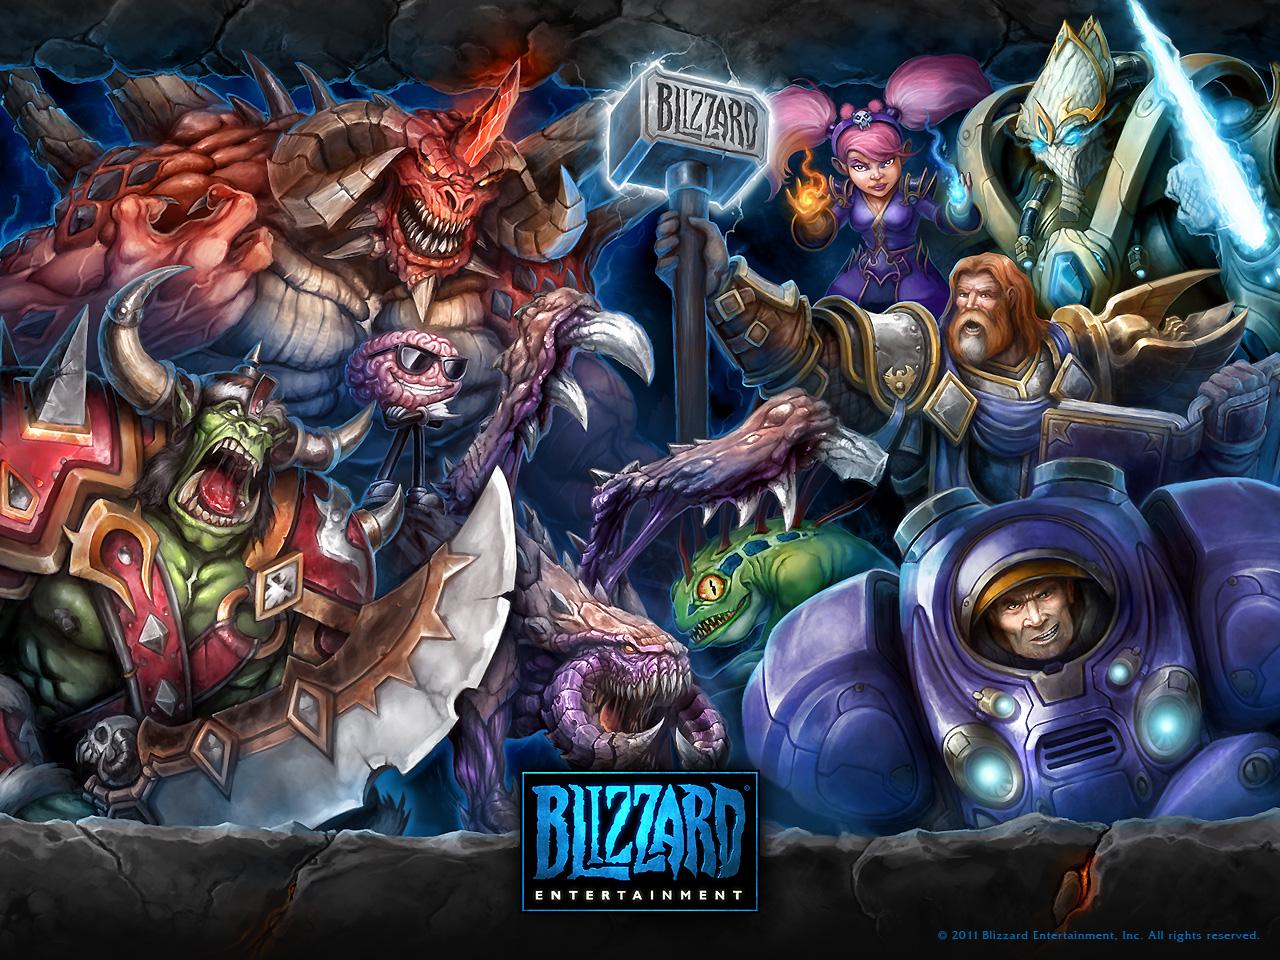 Download Blizzard Entertainment Wallpaper 1280x960 1280x960